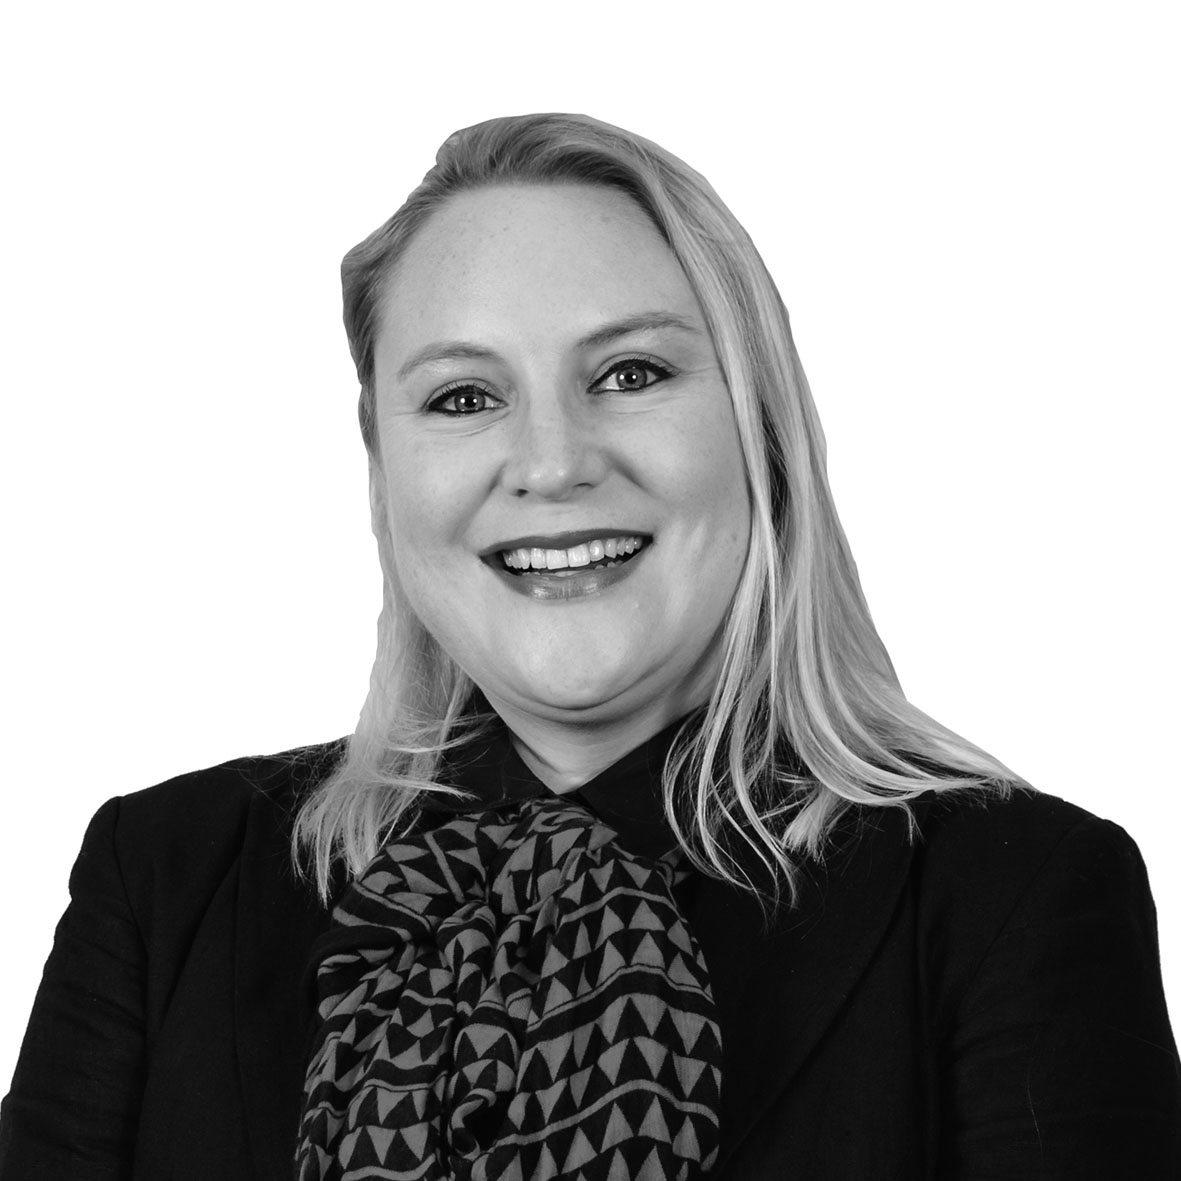 Lara Hughes-Thom - Carrick Investment Services